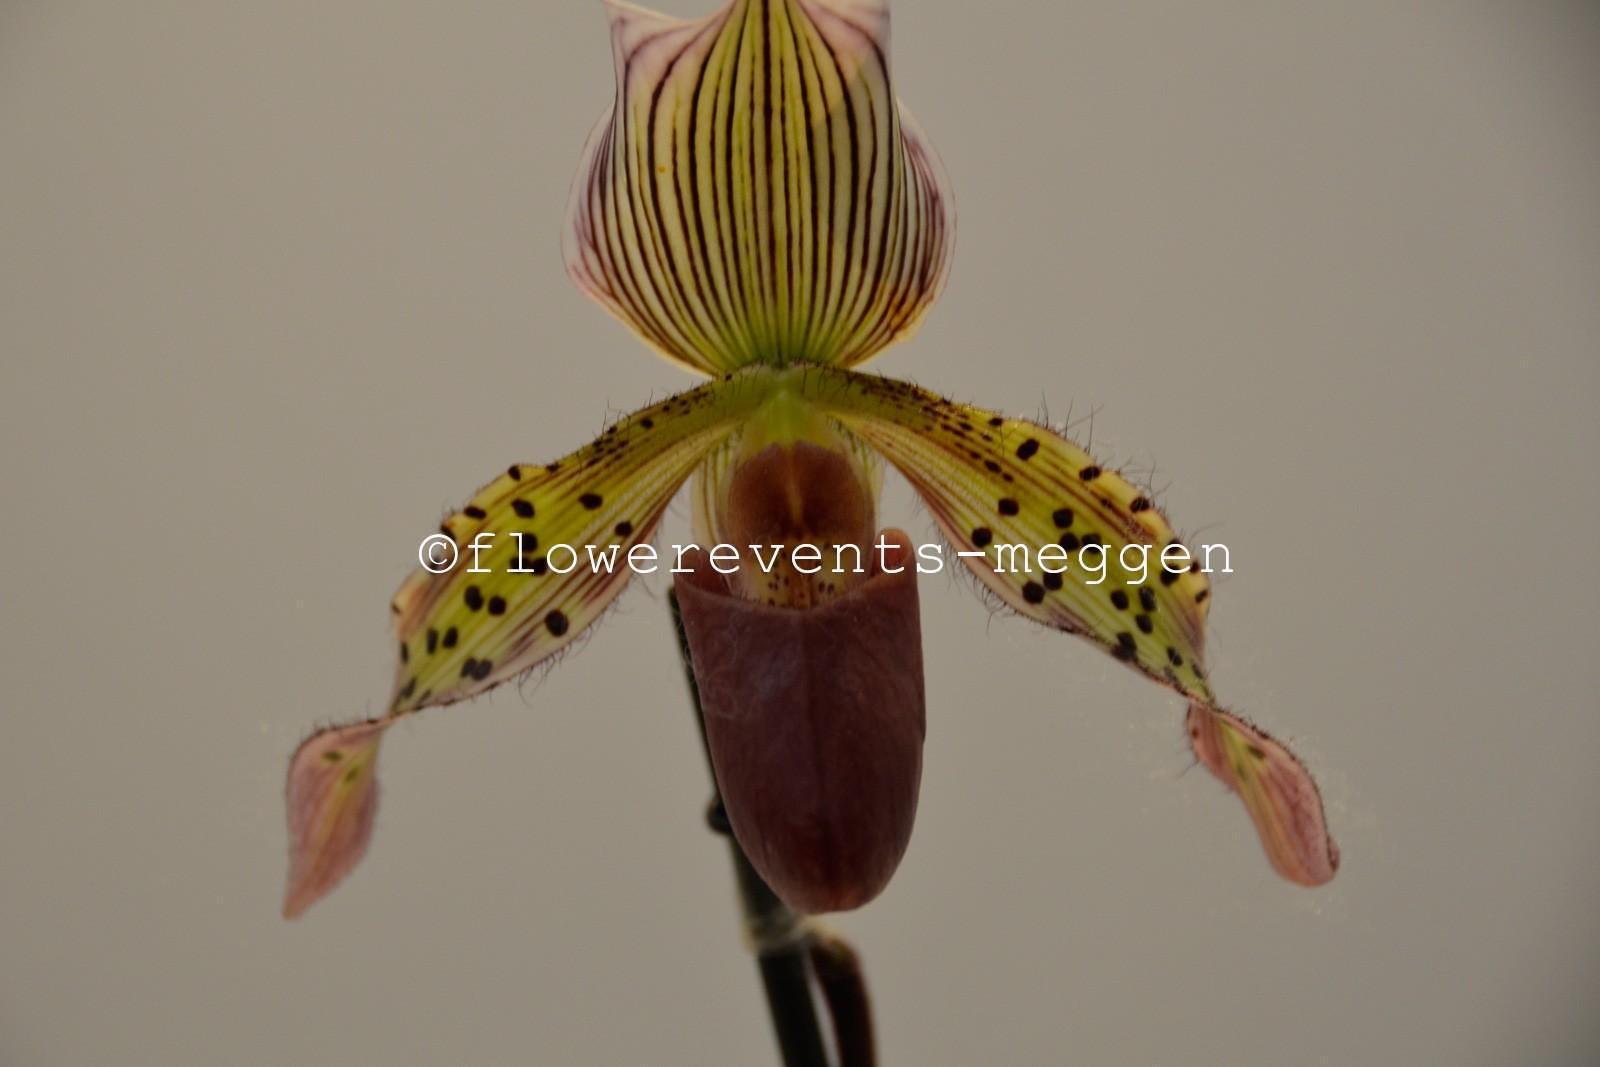 orchideen pflanzen luzern phalaenopsis vanda blumen. Black Bedroom Furniture Sets. Home Design Ideas